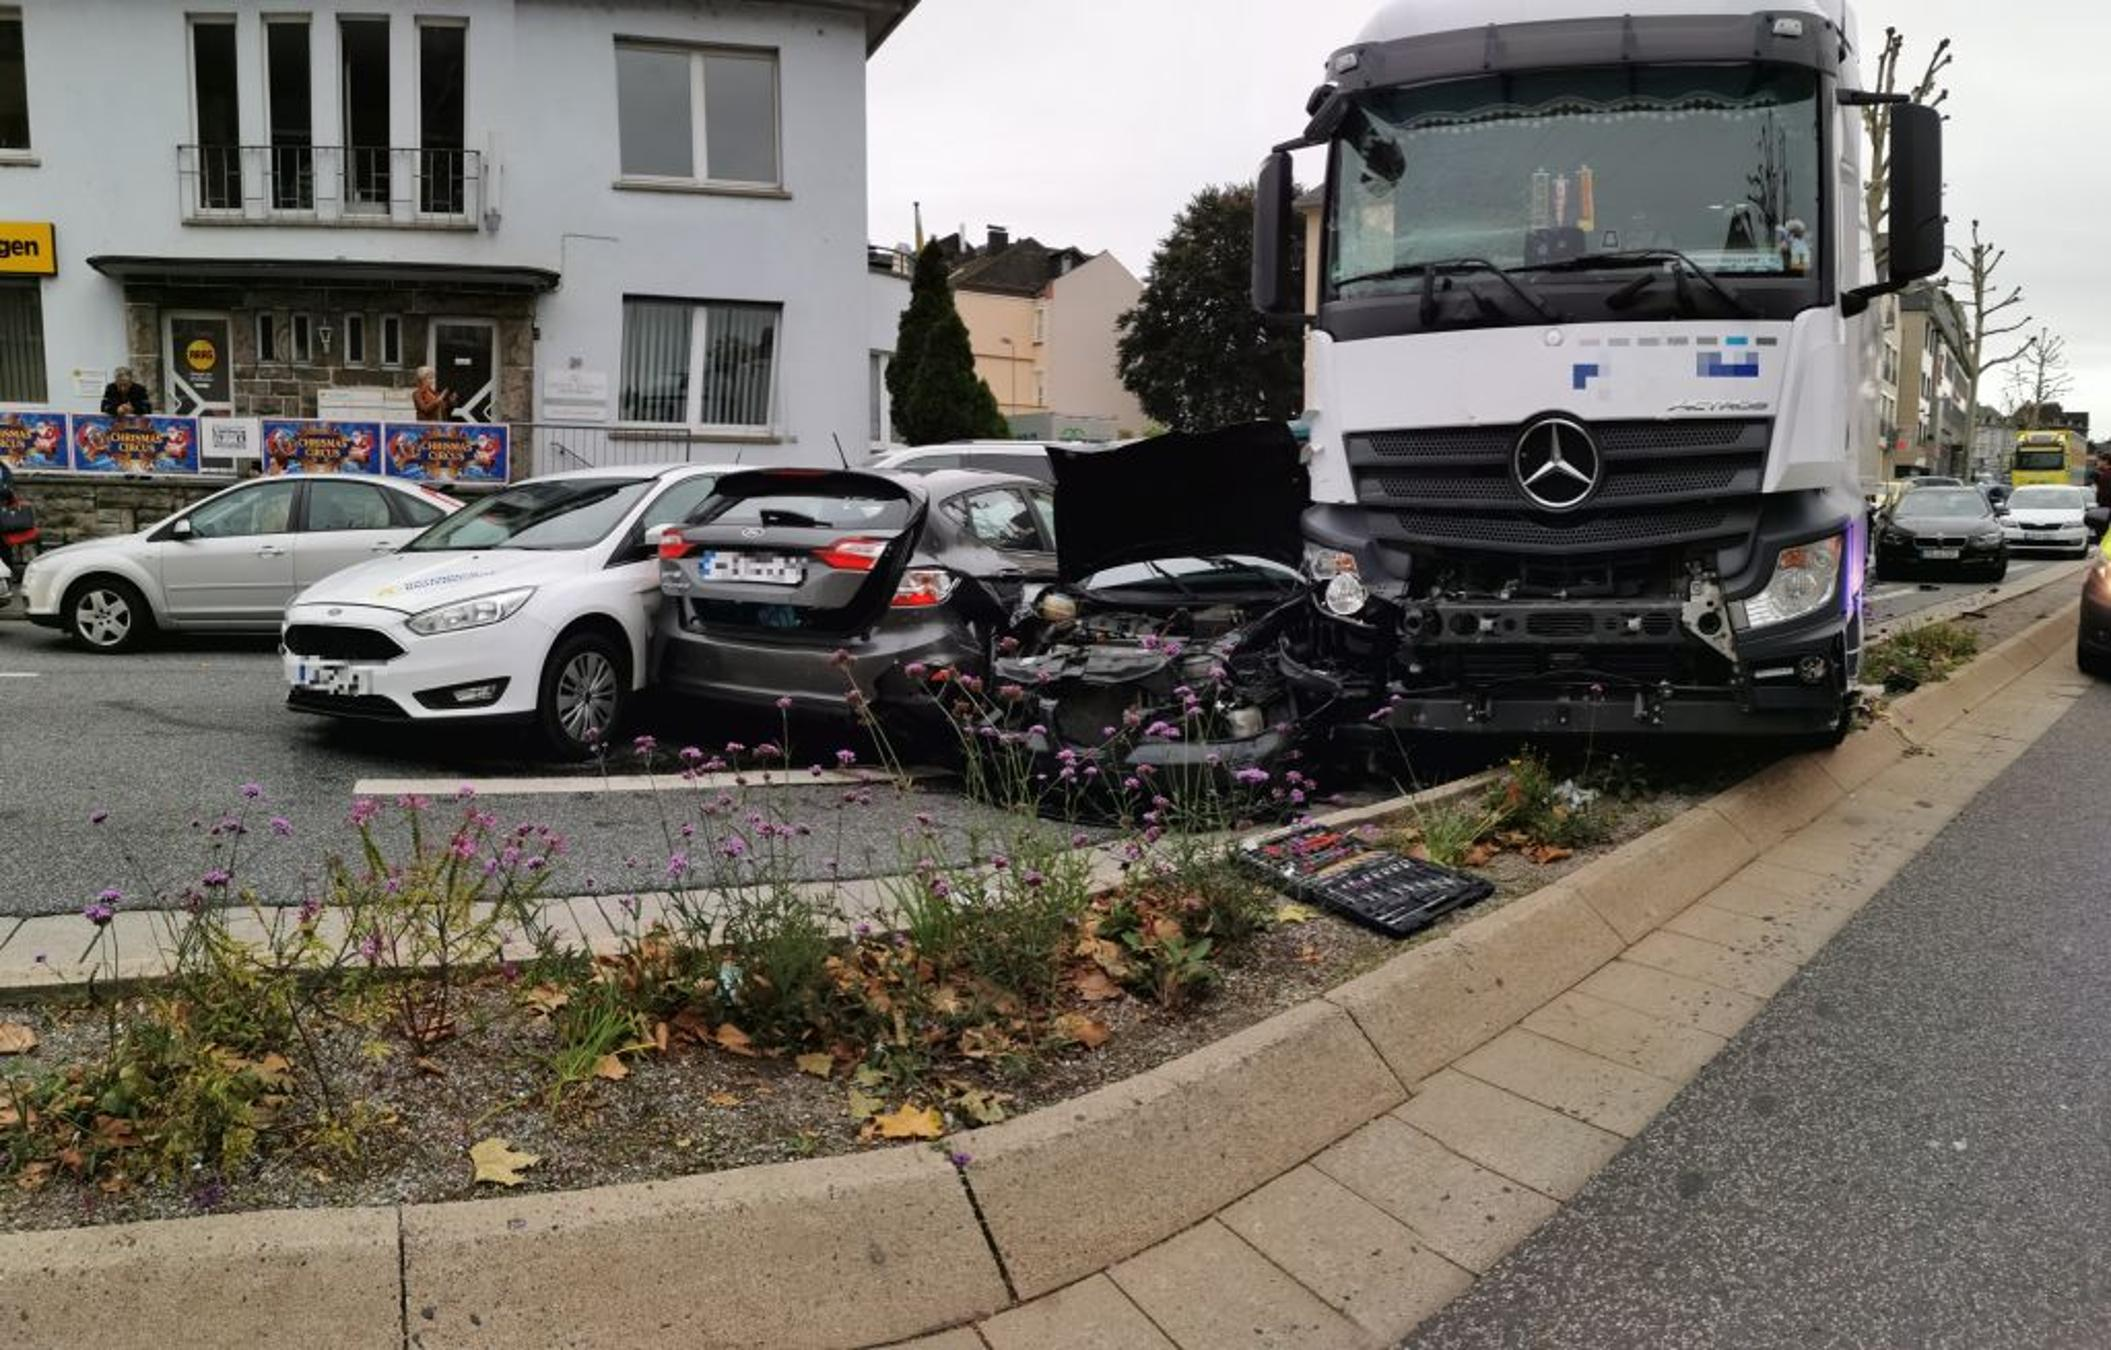 Limburg: Lkw rammt mehrere Autos - © Foto: Stefan Dickmann